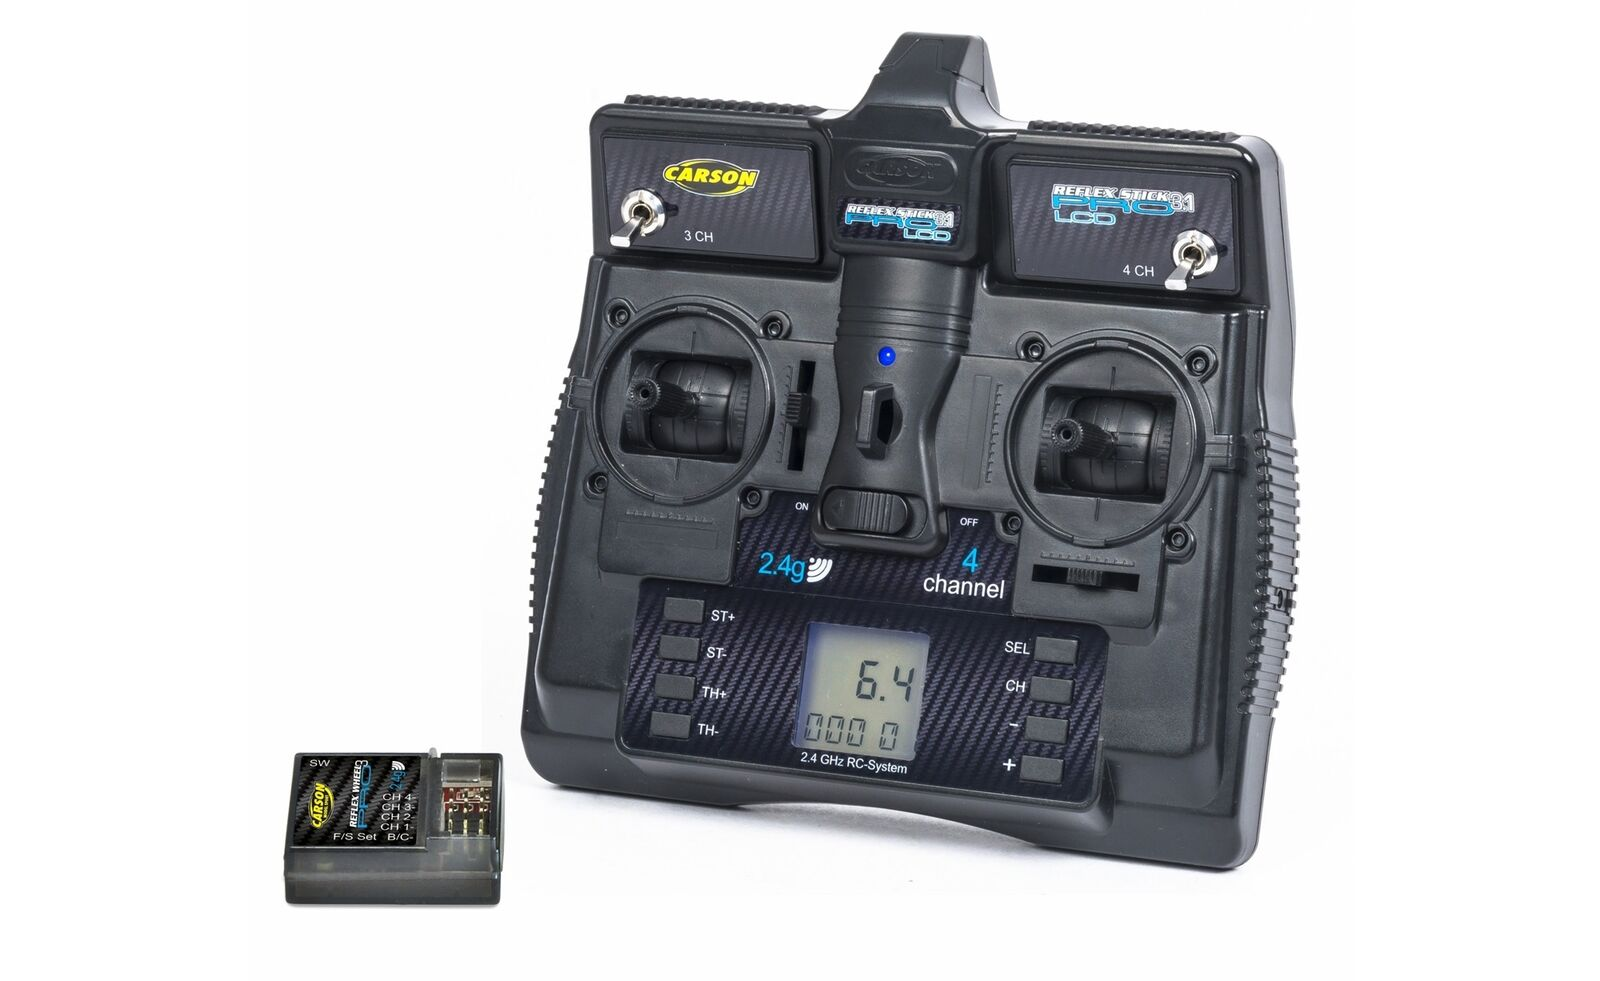 Carson 500500085-FS reflex stick pro 3.1 2.4g LCD 4 canal mercancía nueva